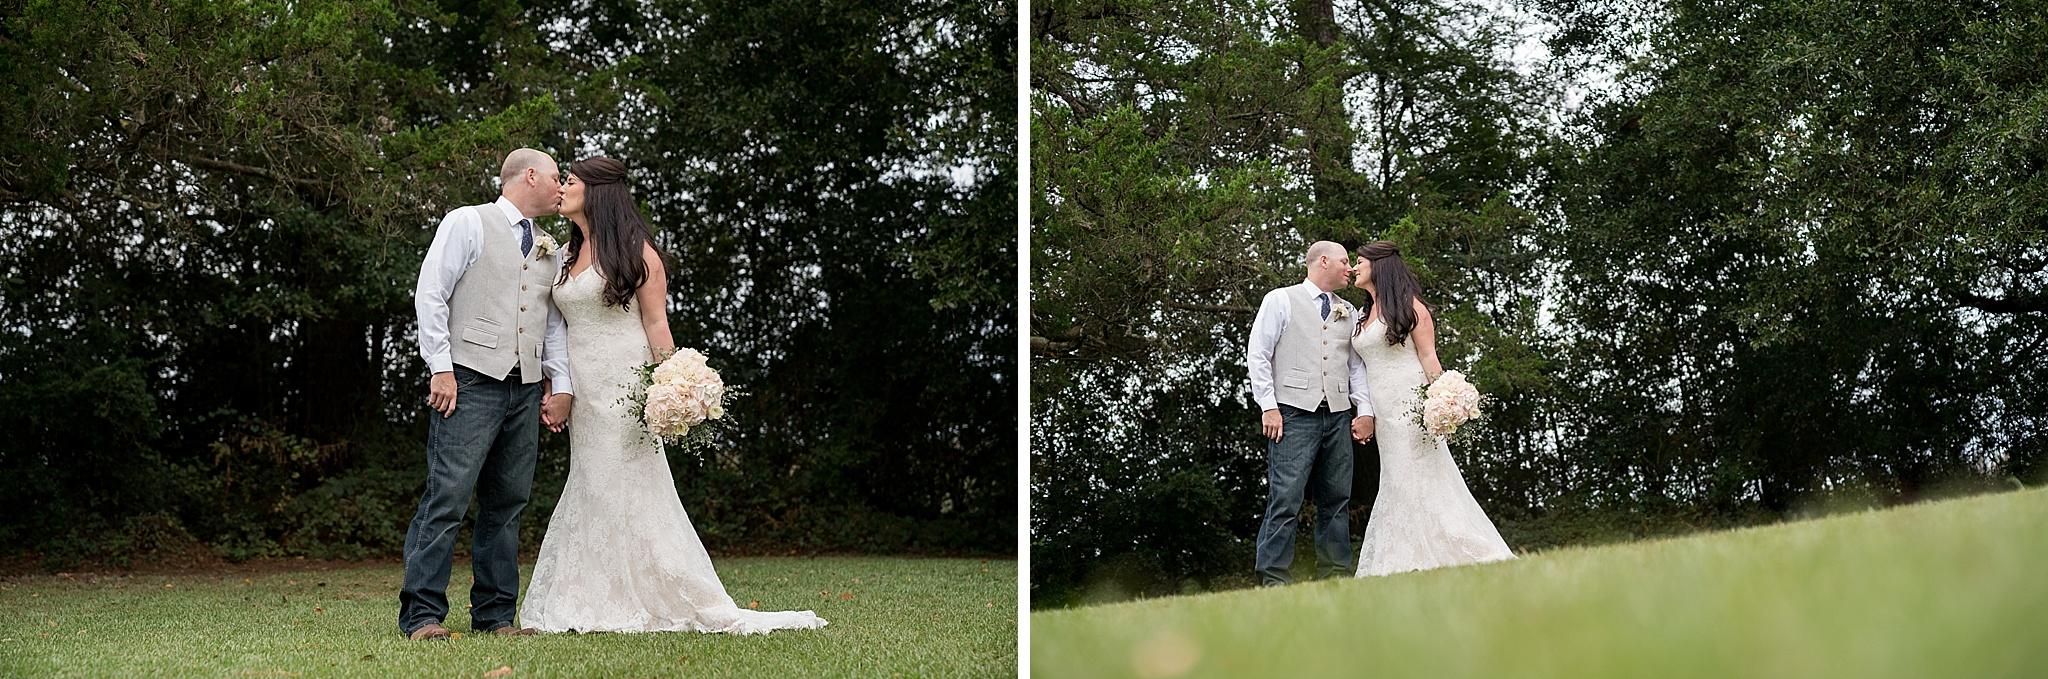 Tarboro-NC-Wedding-Photographer-036.jpg